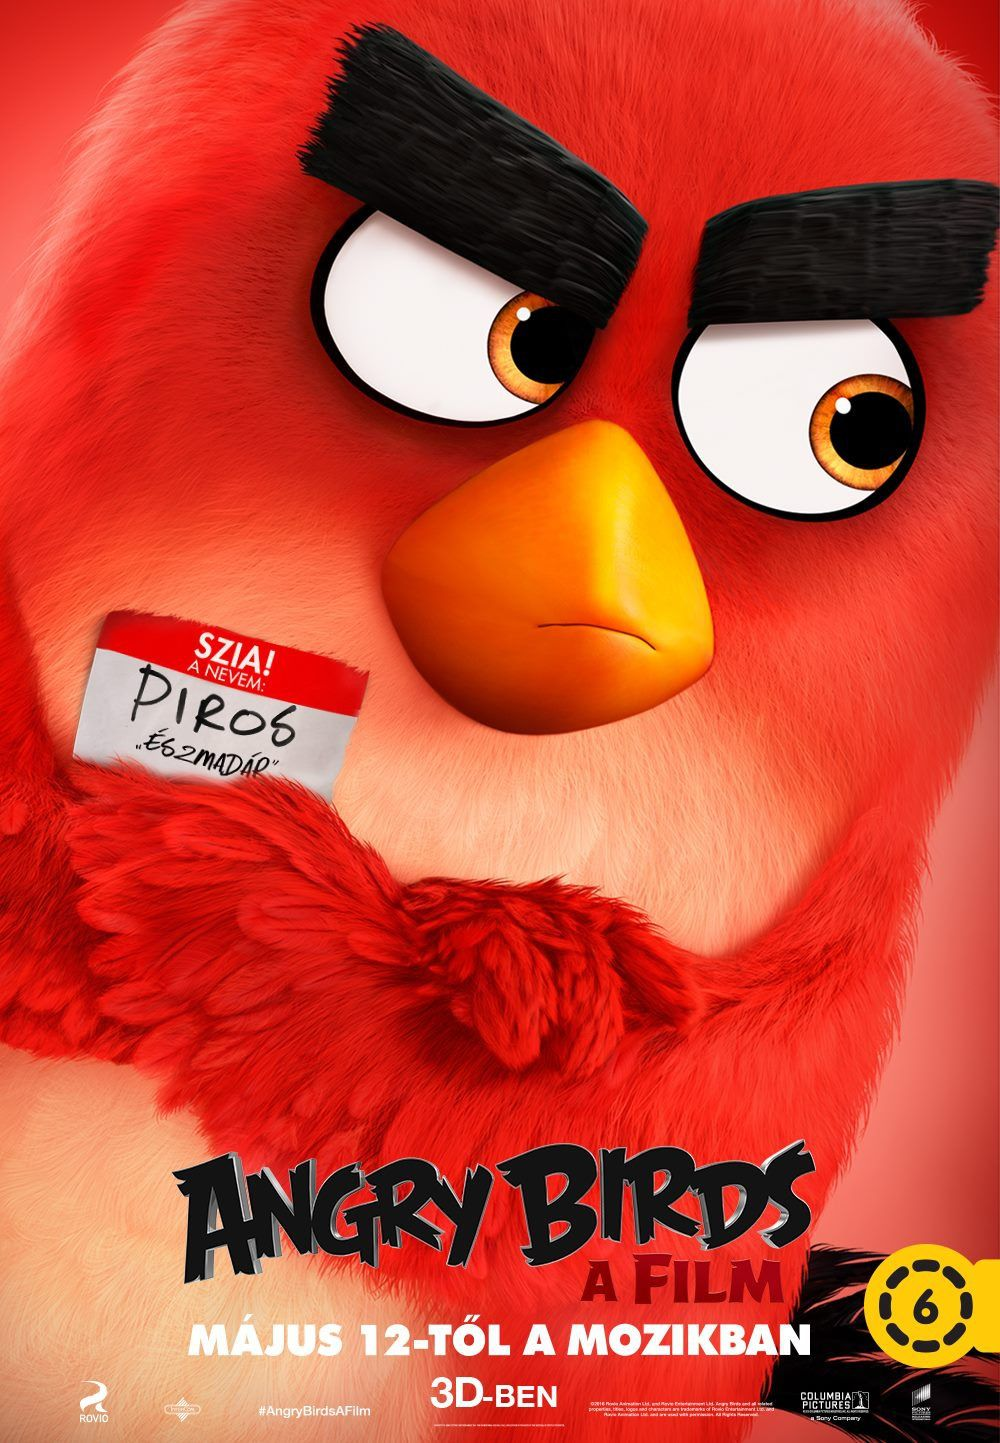 Angry Birds Angry Birds Movie Angry Birds Angry Birds 2016